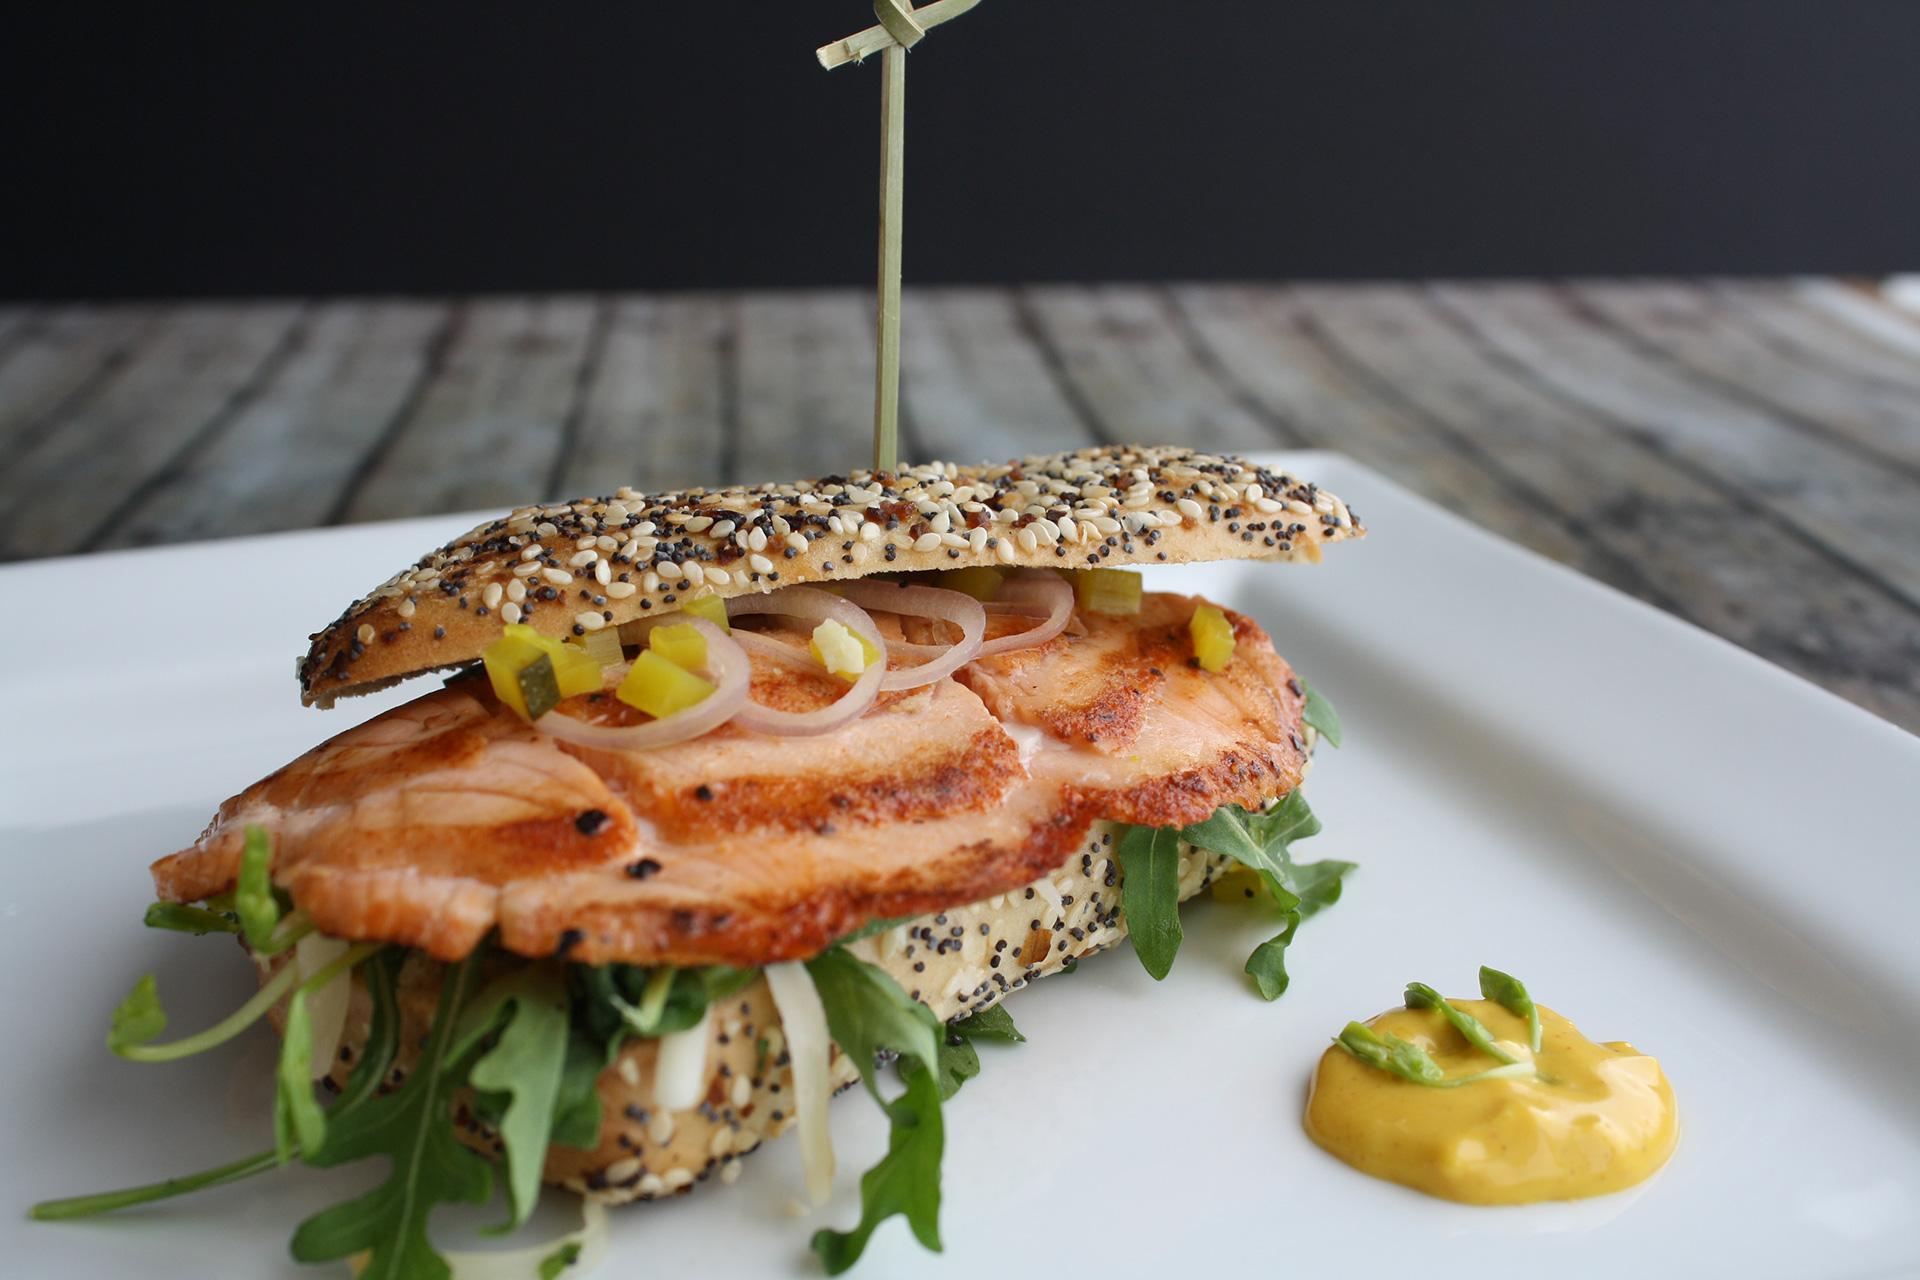 Sandwich with Pastrami-style Atlantic Smoked Salmon